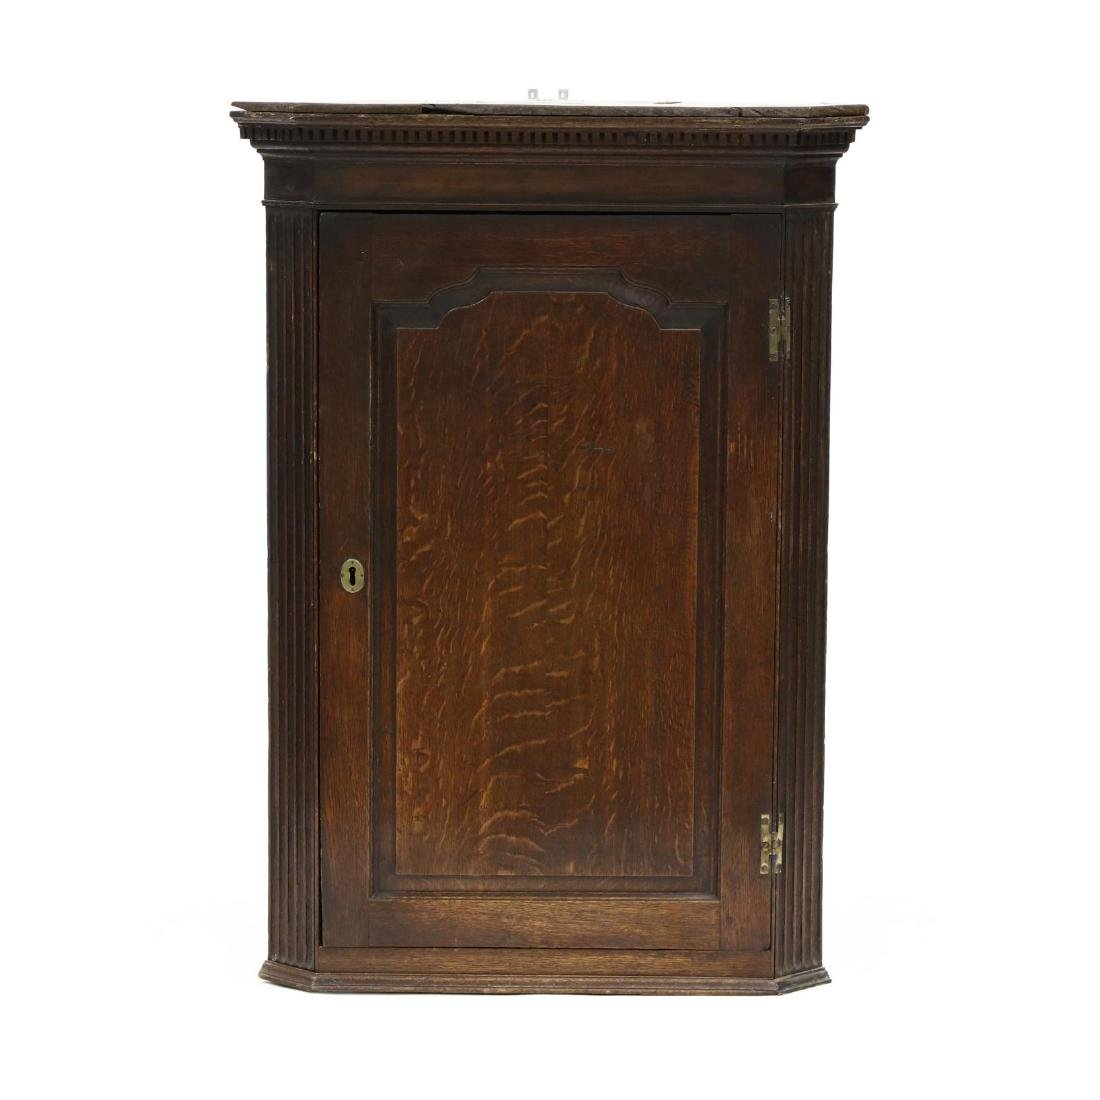 George III Carved Oak Hanging Corner Cupboard